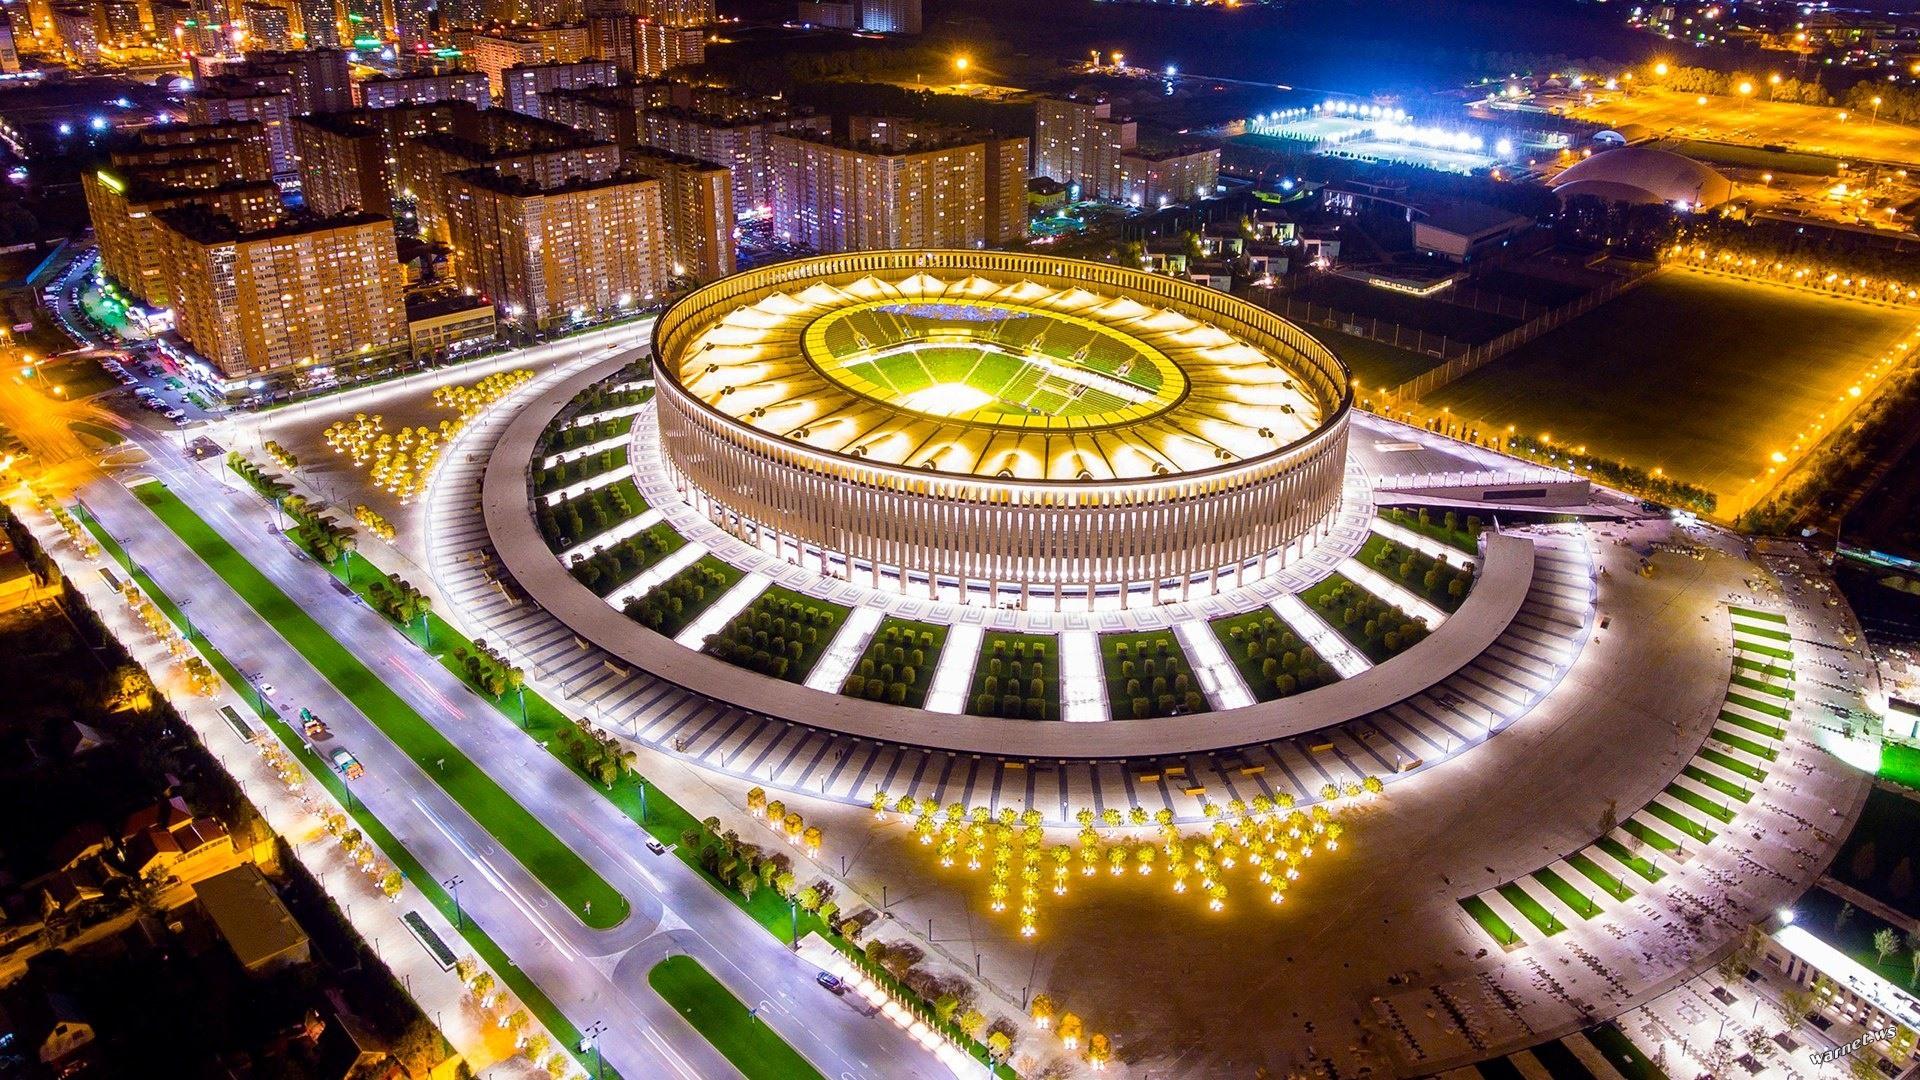 Stadium Soccer Football Sports Qhd Wallpaper 2560x2560: Wallpaper Russia, Kuban, Krasnodar, Football Stadium